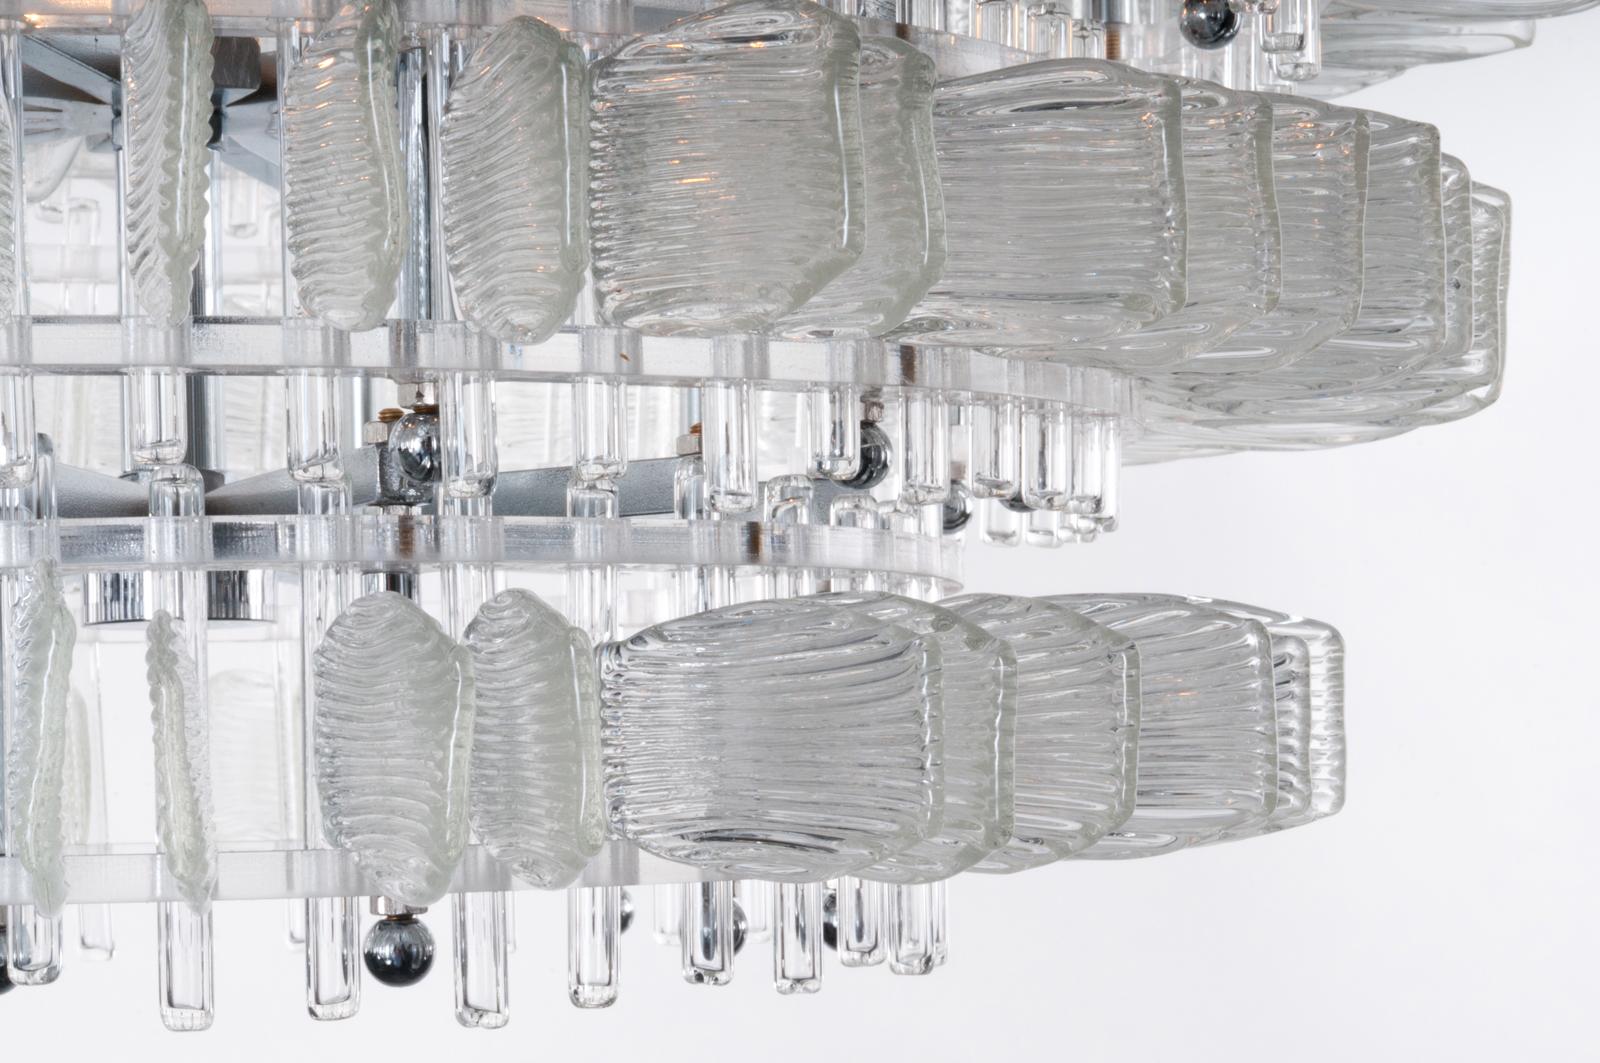 anemone-plafonnier-ceiling-veronese-tal-lancman-maurizio-galante-31.jpg